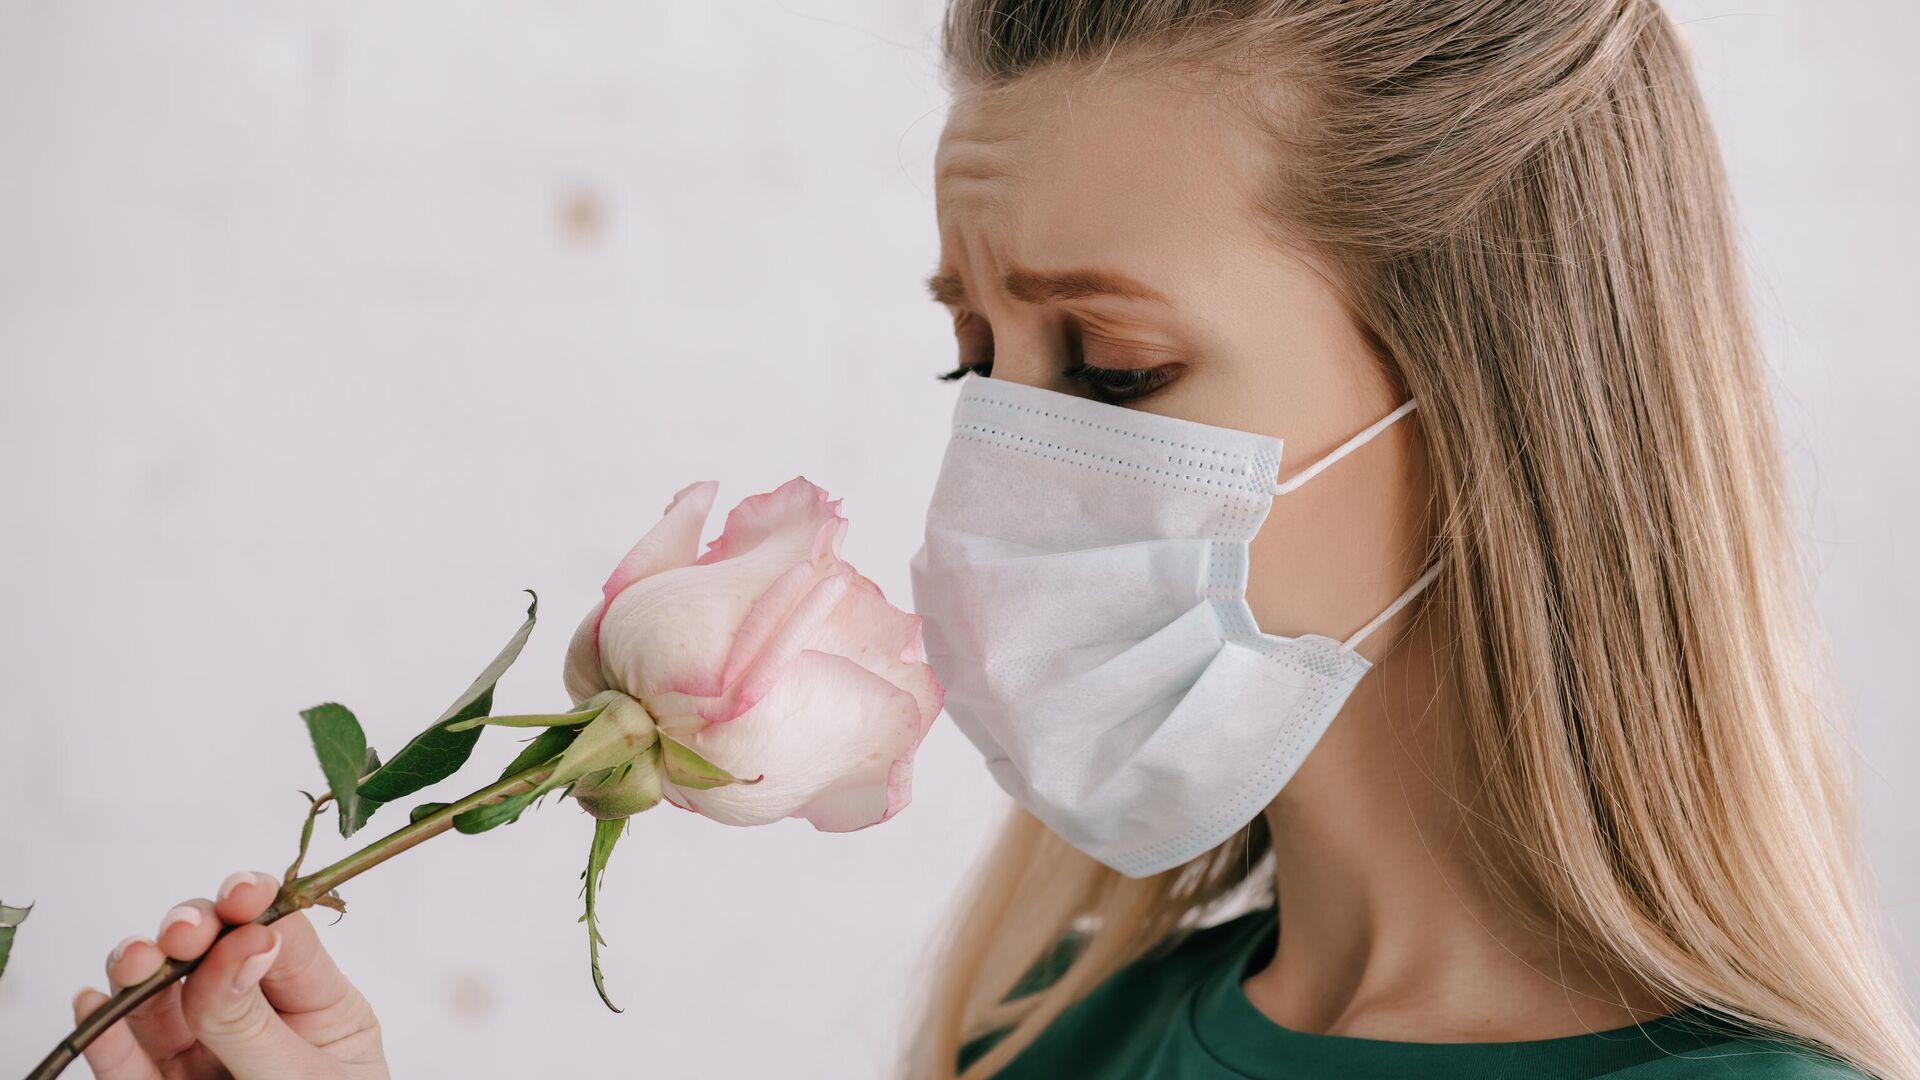 Фитнес для носа. Как вернуть запахи после COVID-19